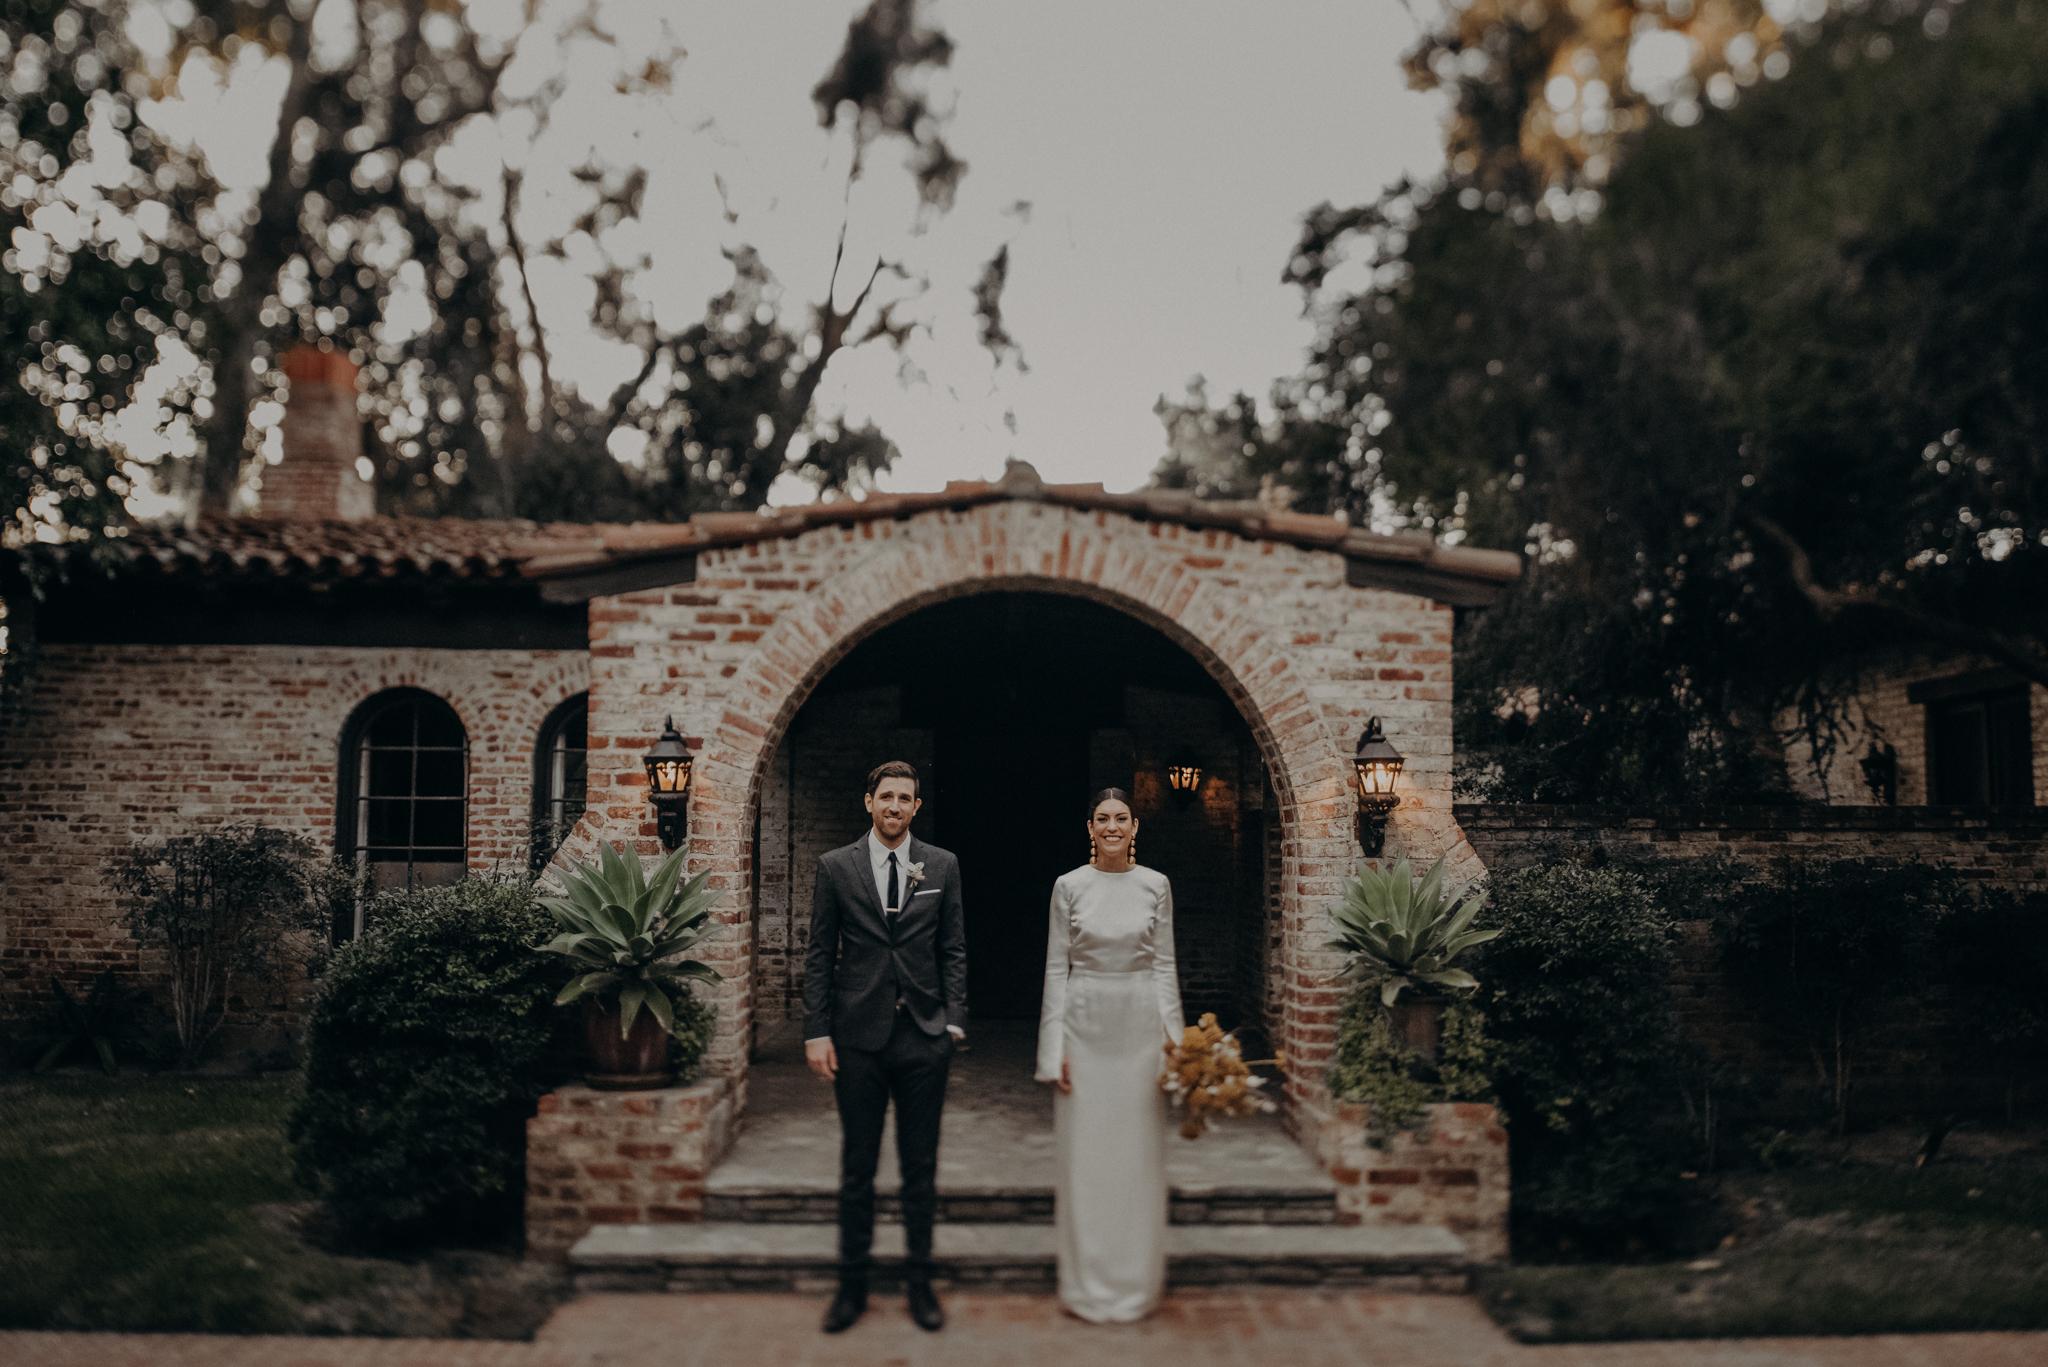 wedding photographer in los angeles, la wedding photographer, hummingbird nest ranch venue photographs,